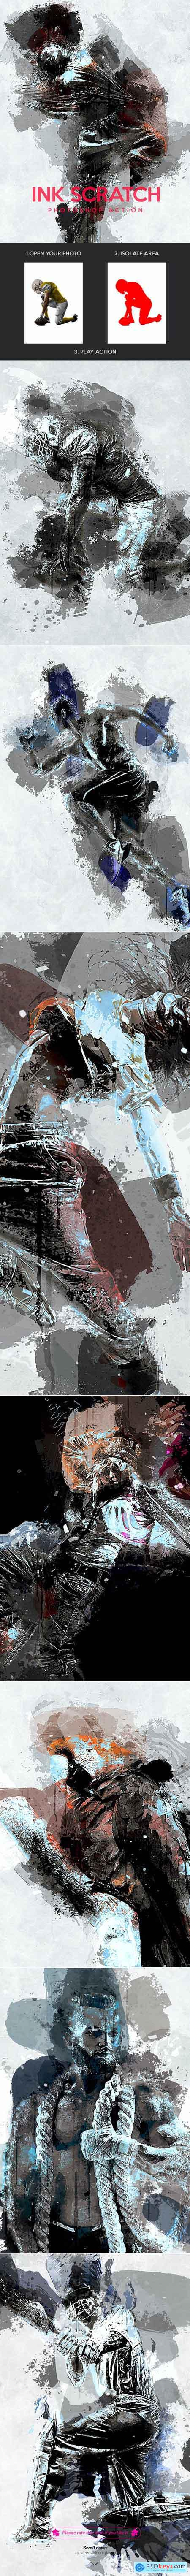 Ink Scratch - Photoshop Action 21318489